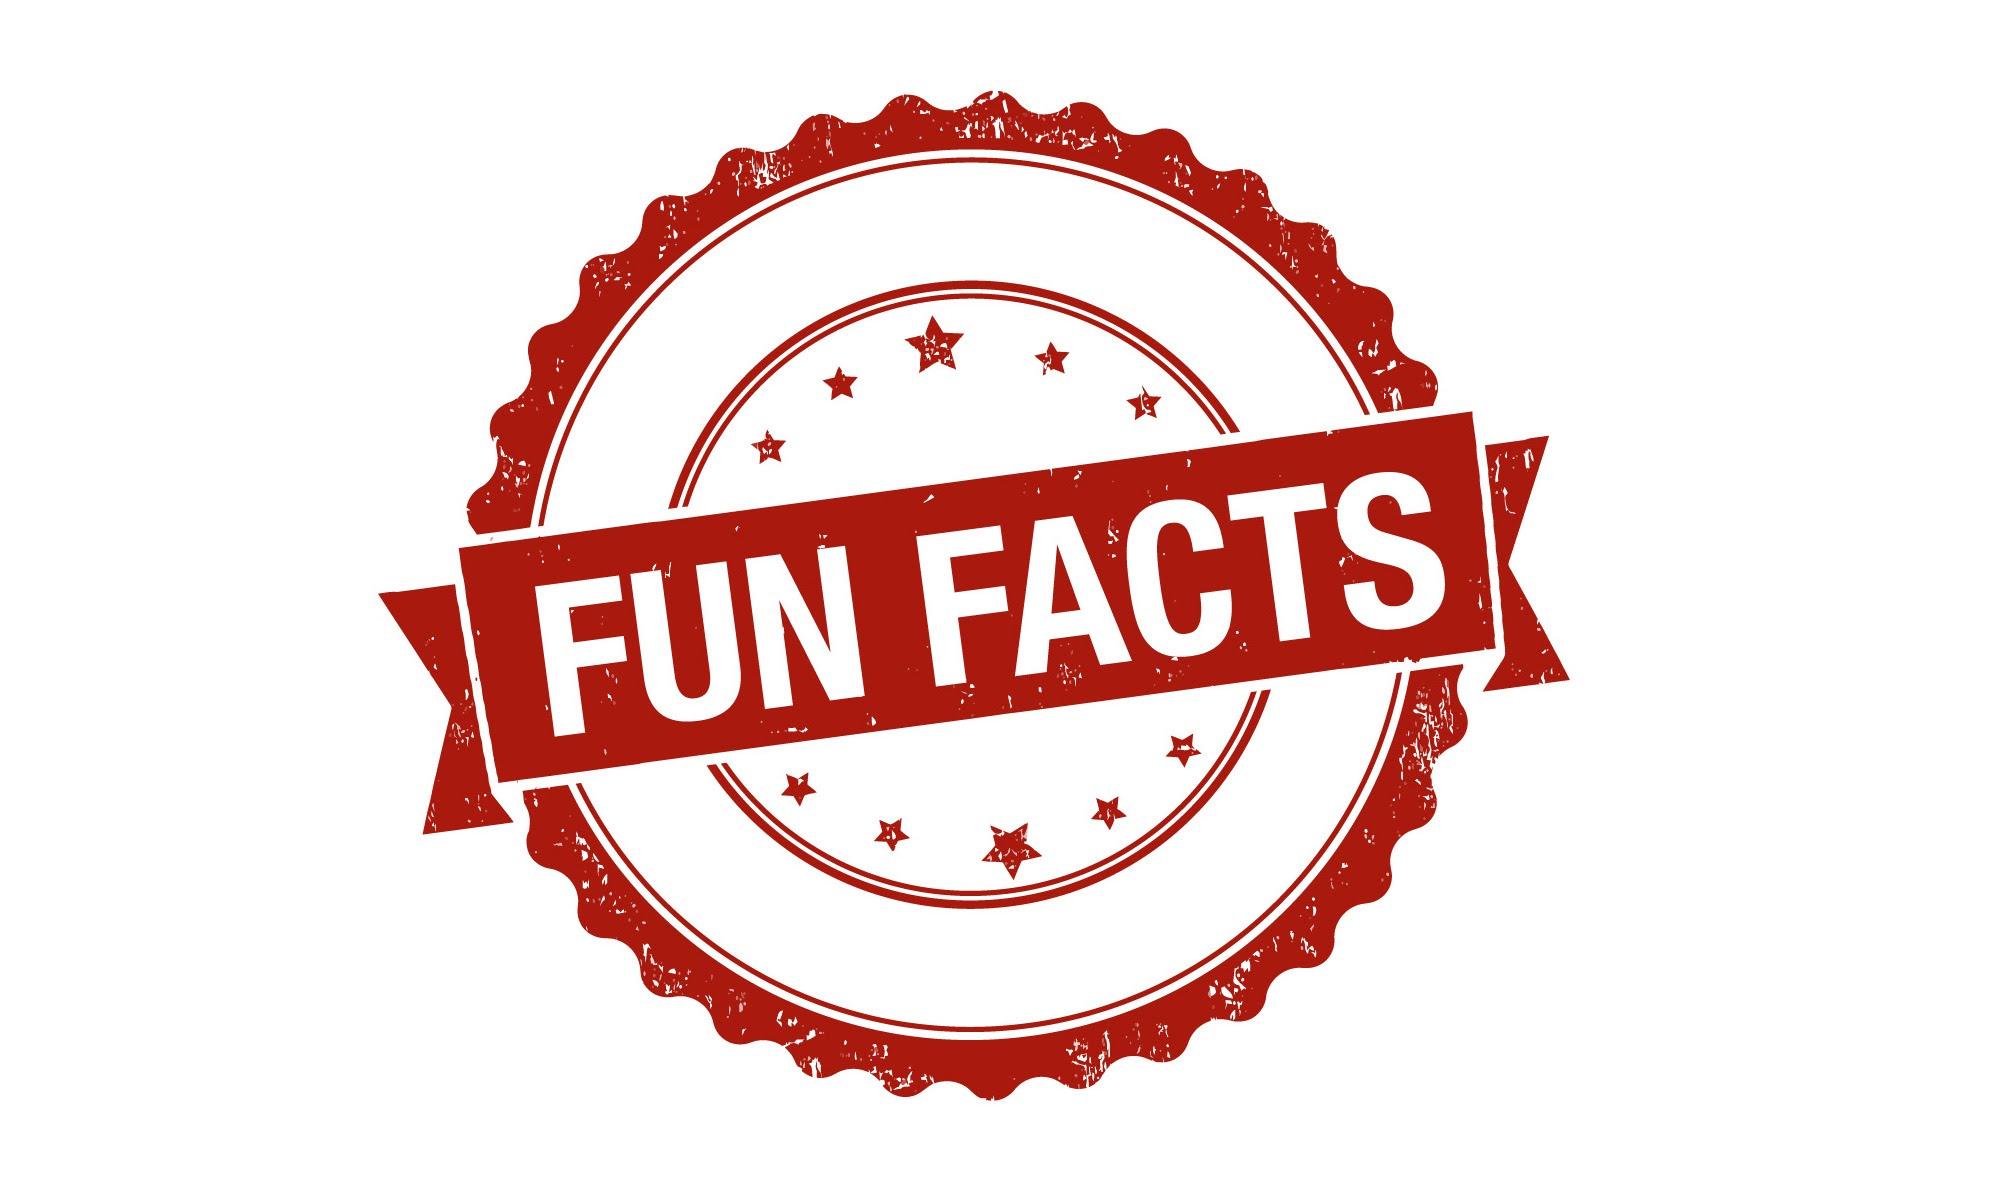 Interesting Fact Clip Art.